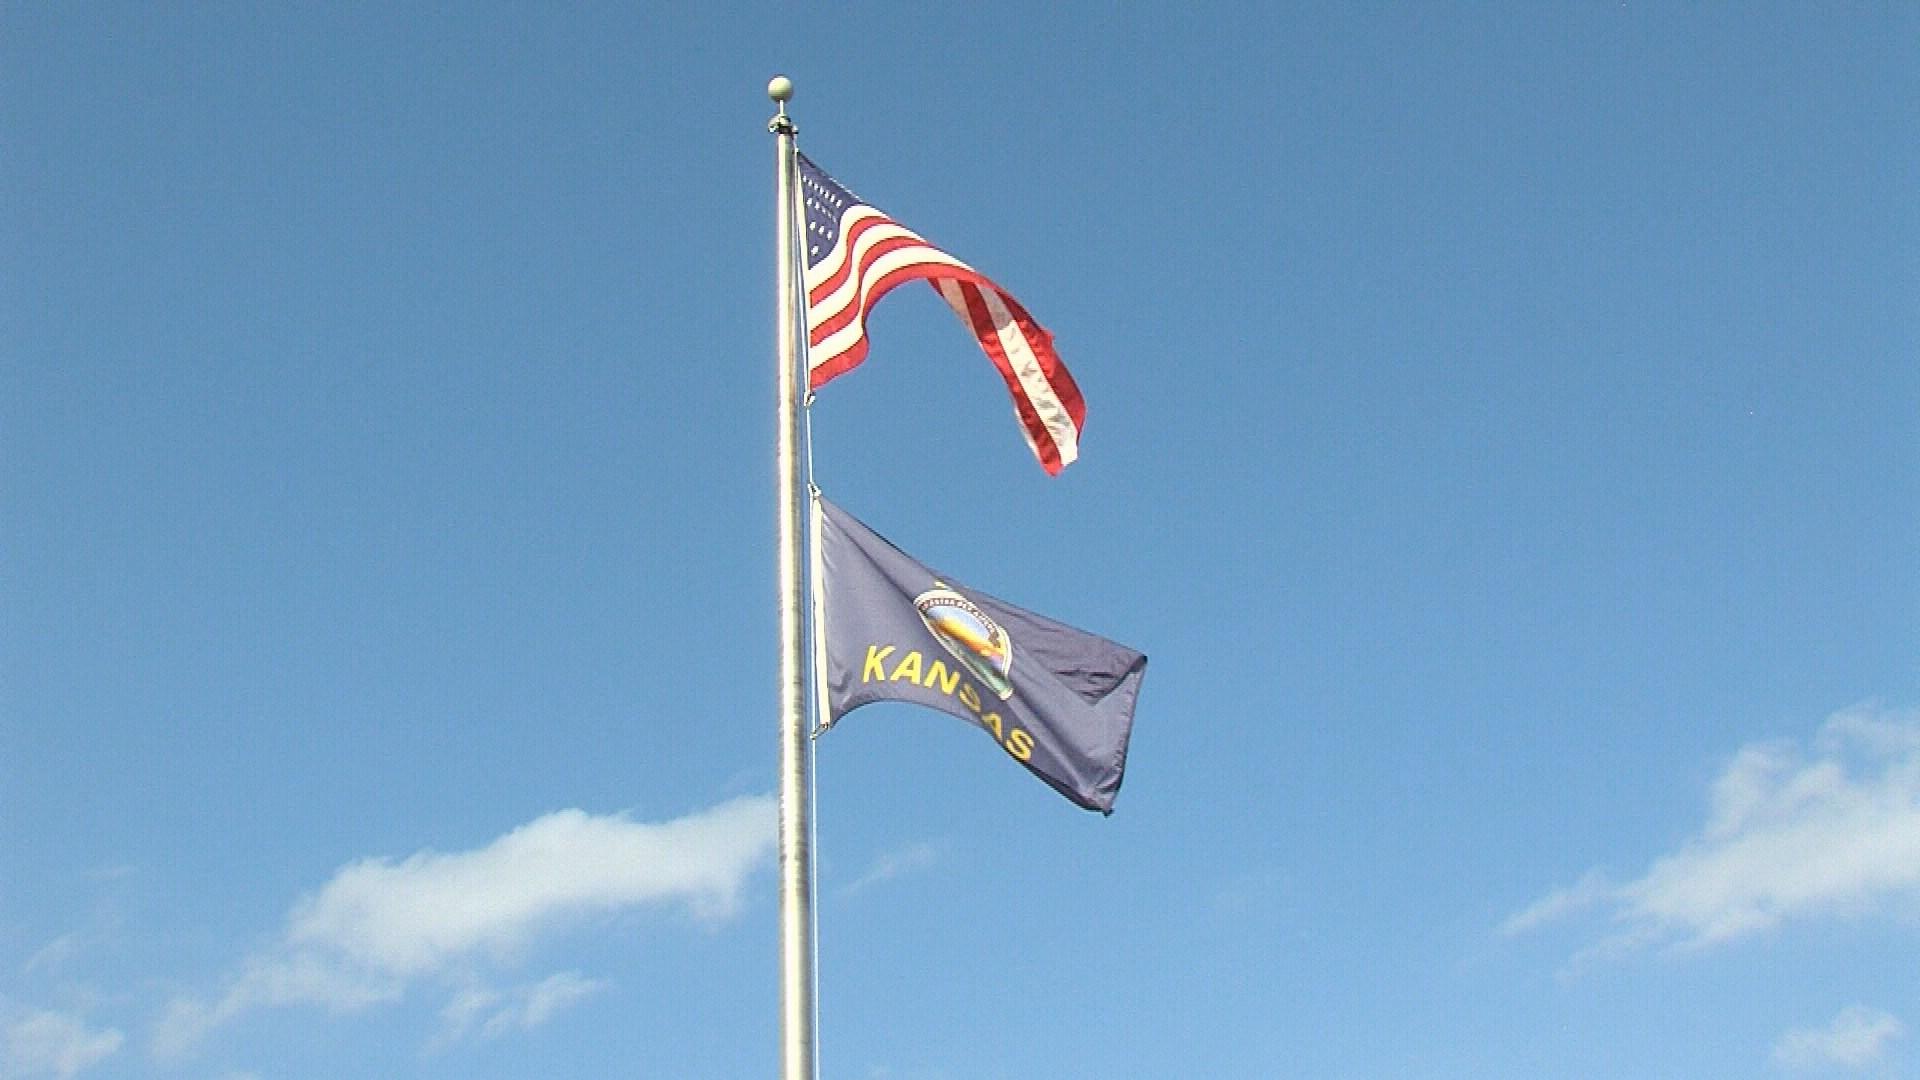 Kansas neosho county stark - Kansas Neosho County Stark 49